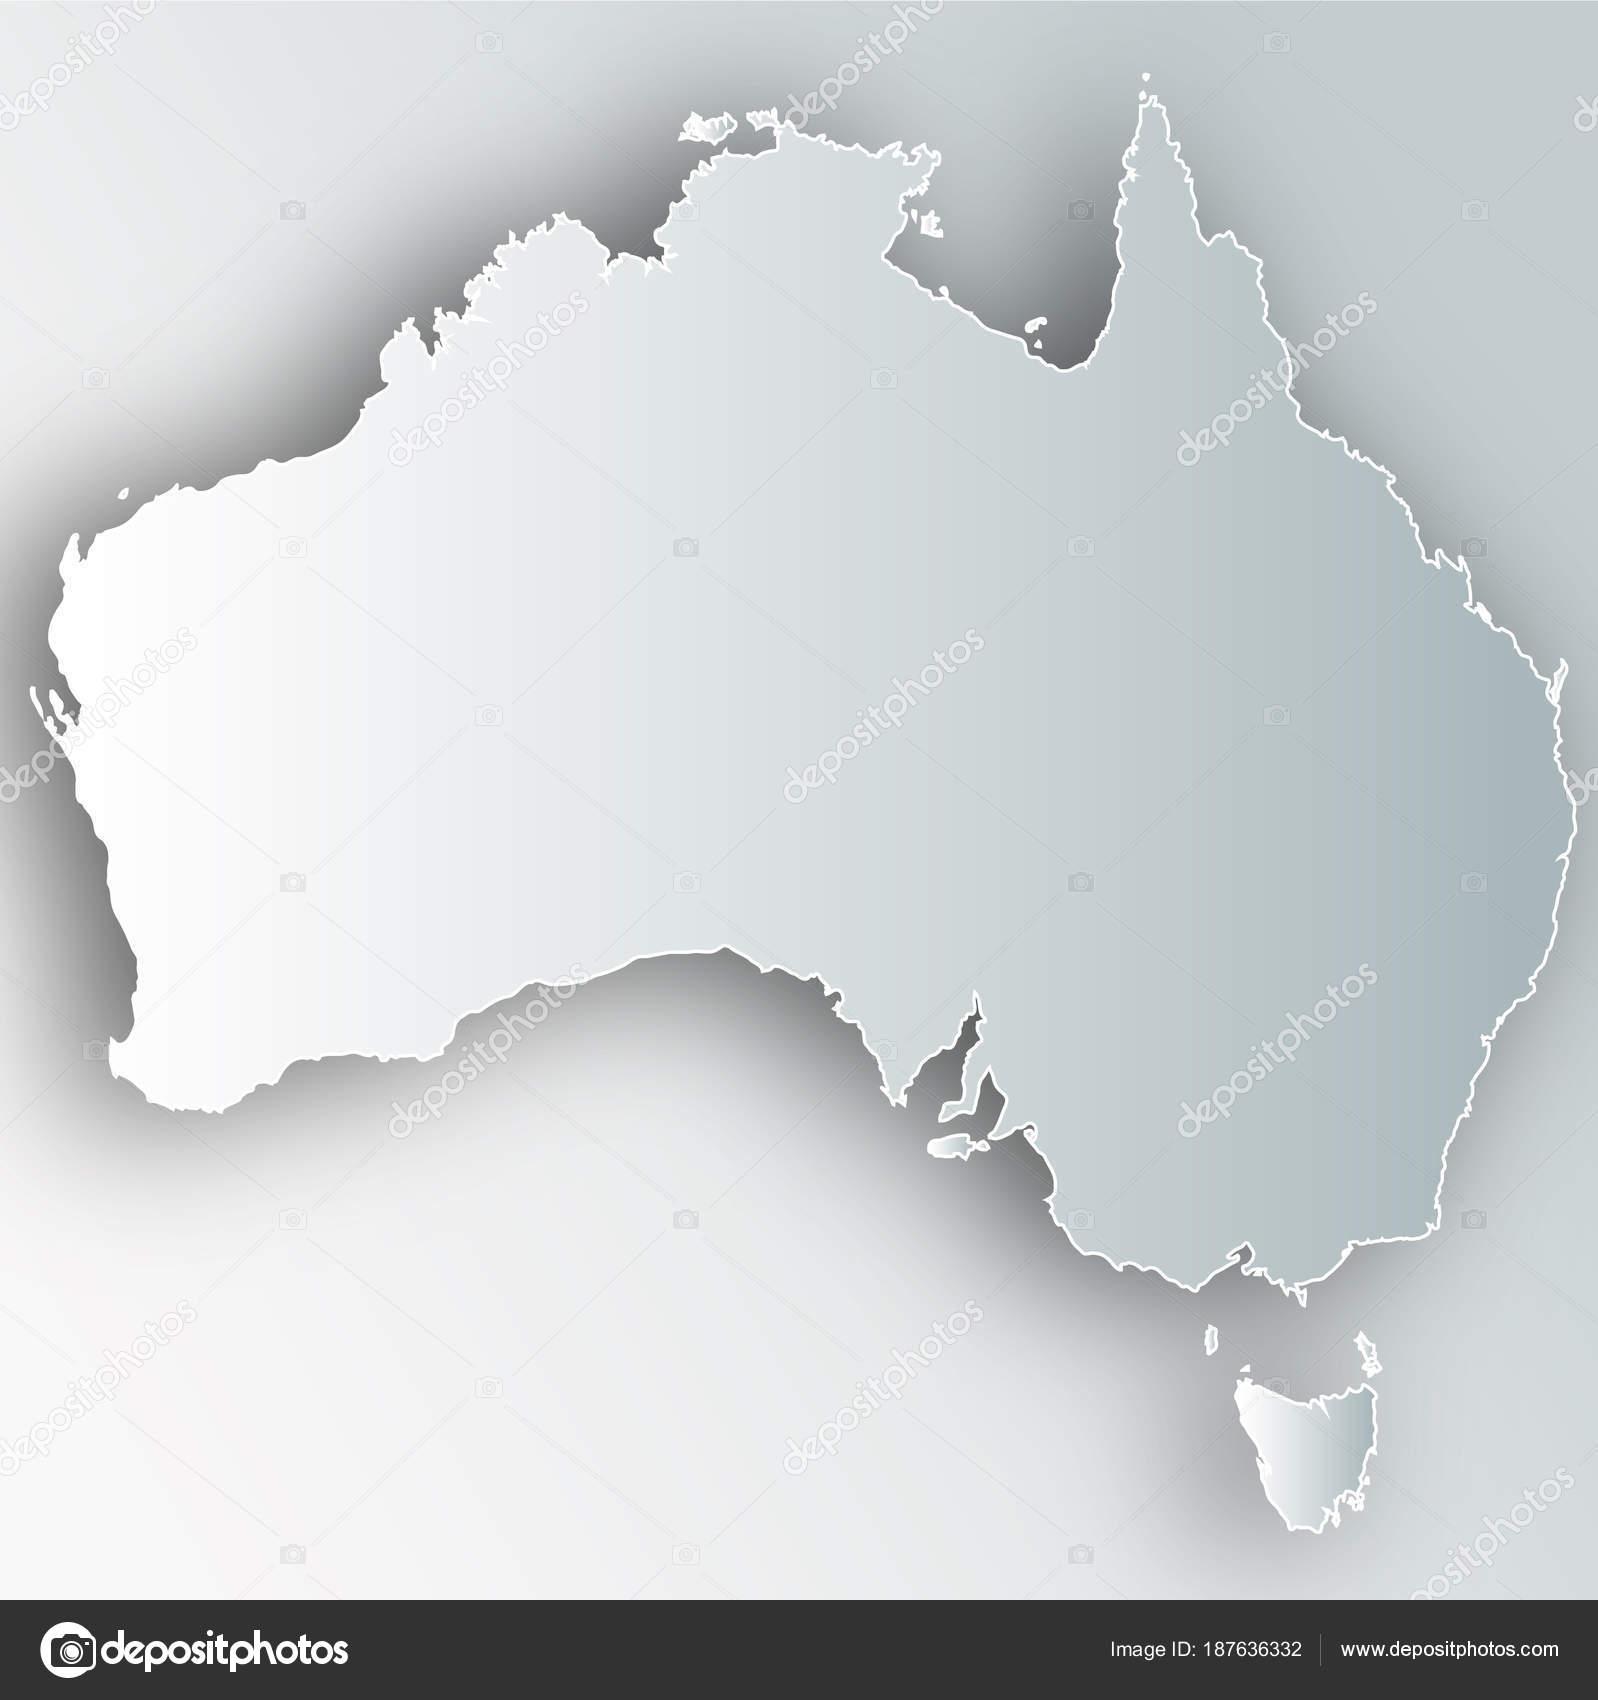 Australia map frame icon stock vector jboy24 187636332 australia map frame icon stock vector gumiabroncs Images